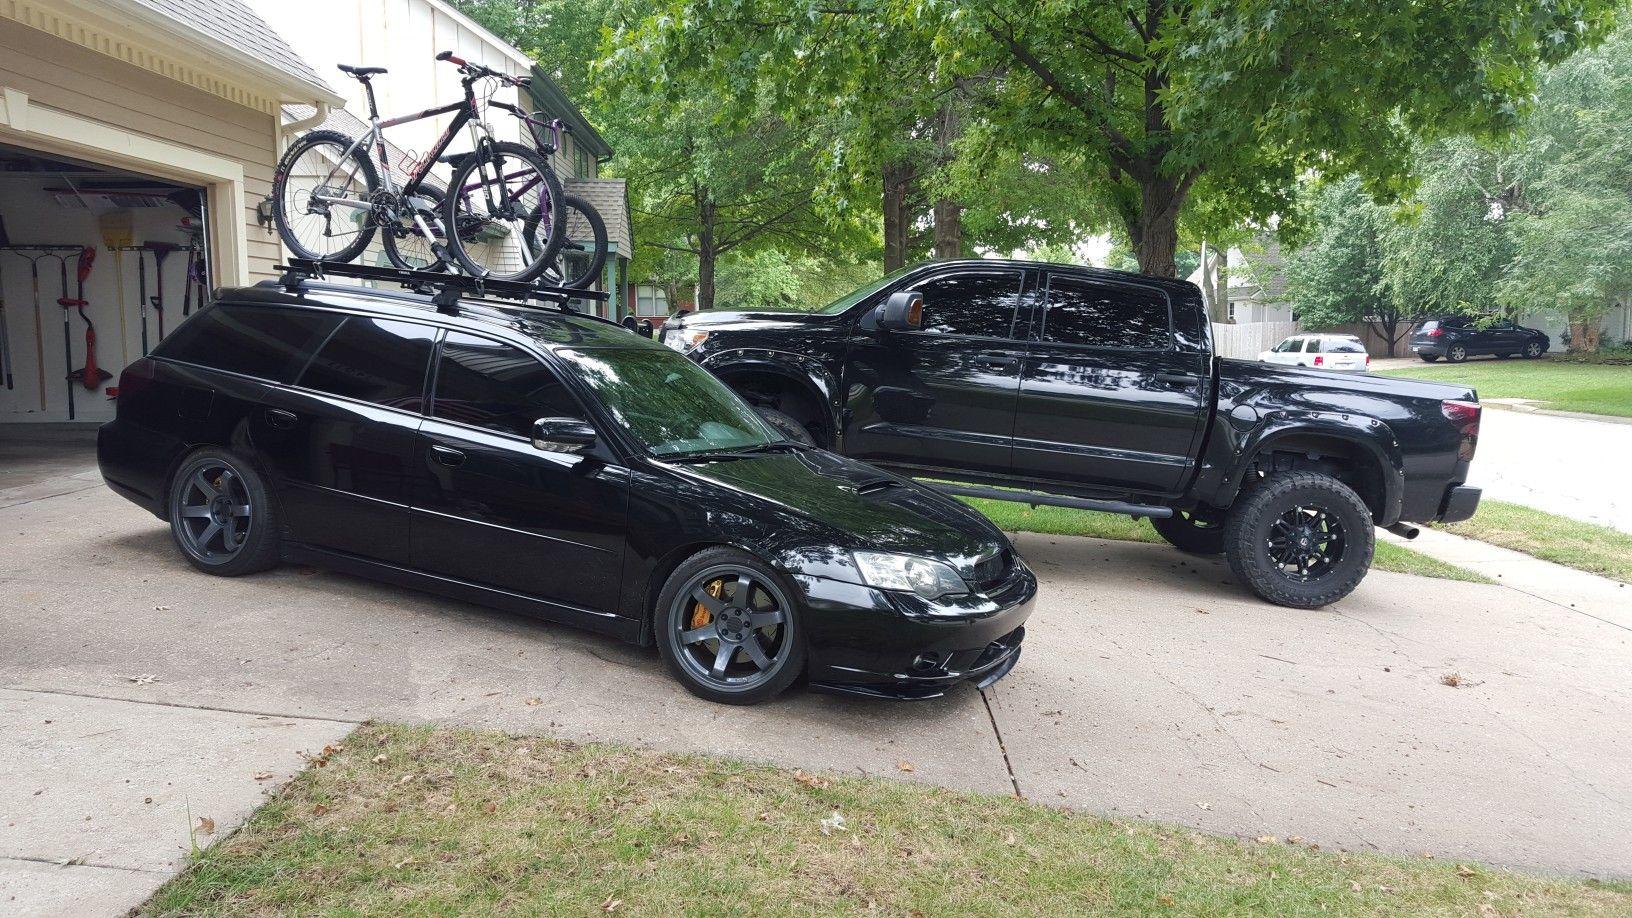 Lgt Swagon Subaru Legacy Gt Subaru Legacy Sti Subaru Legacy